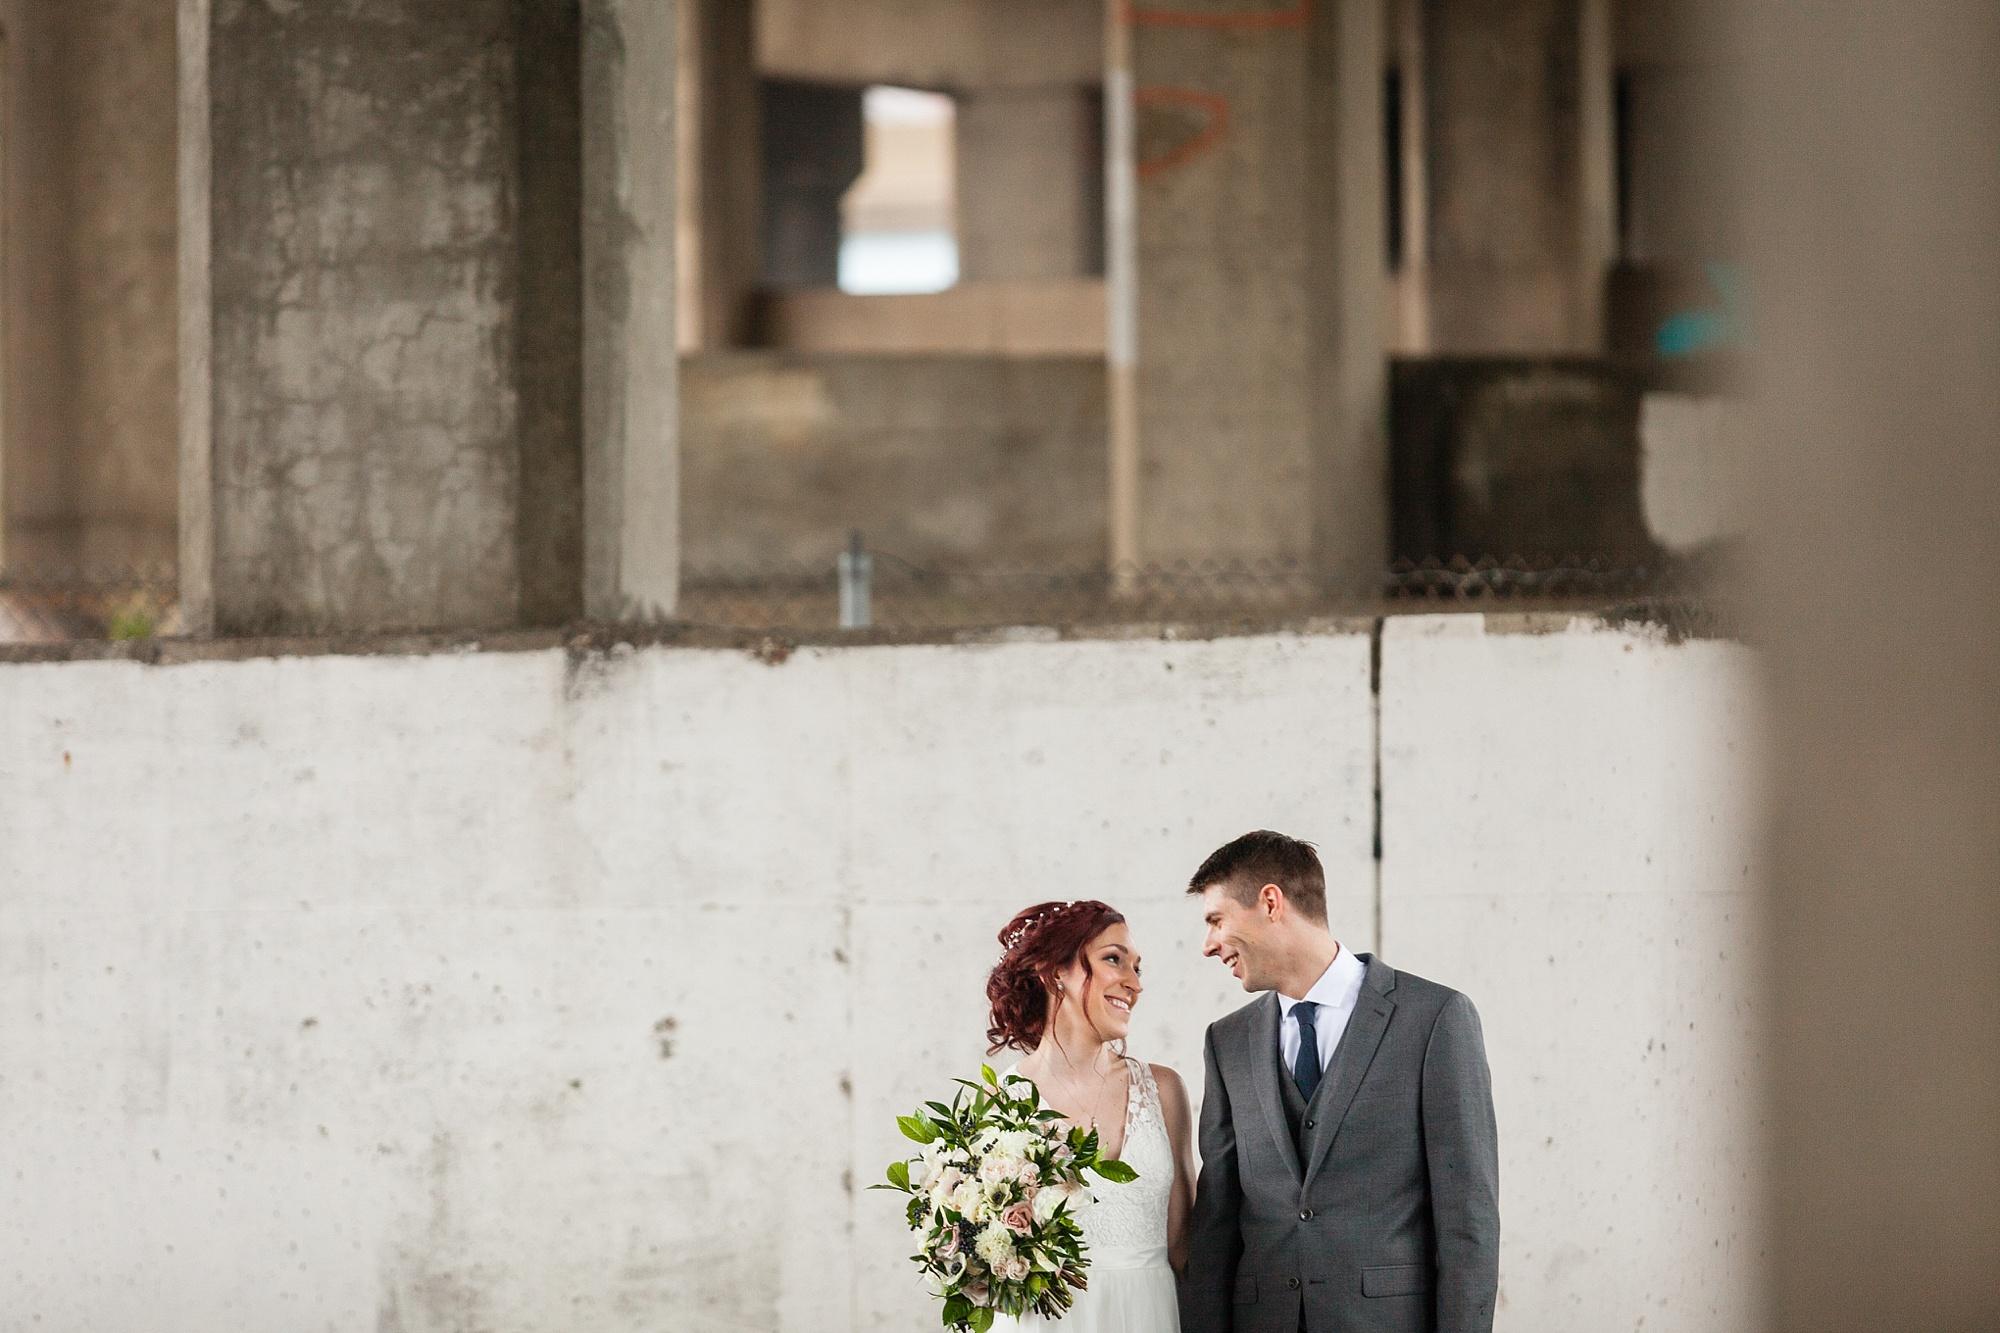 Brandon_Shafer_Photography_Lauren_Ethan_New_Vintage_Place_Grand_Rapids_Wedding_0026.jpg